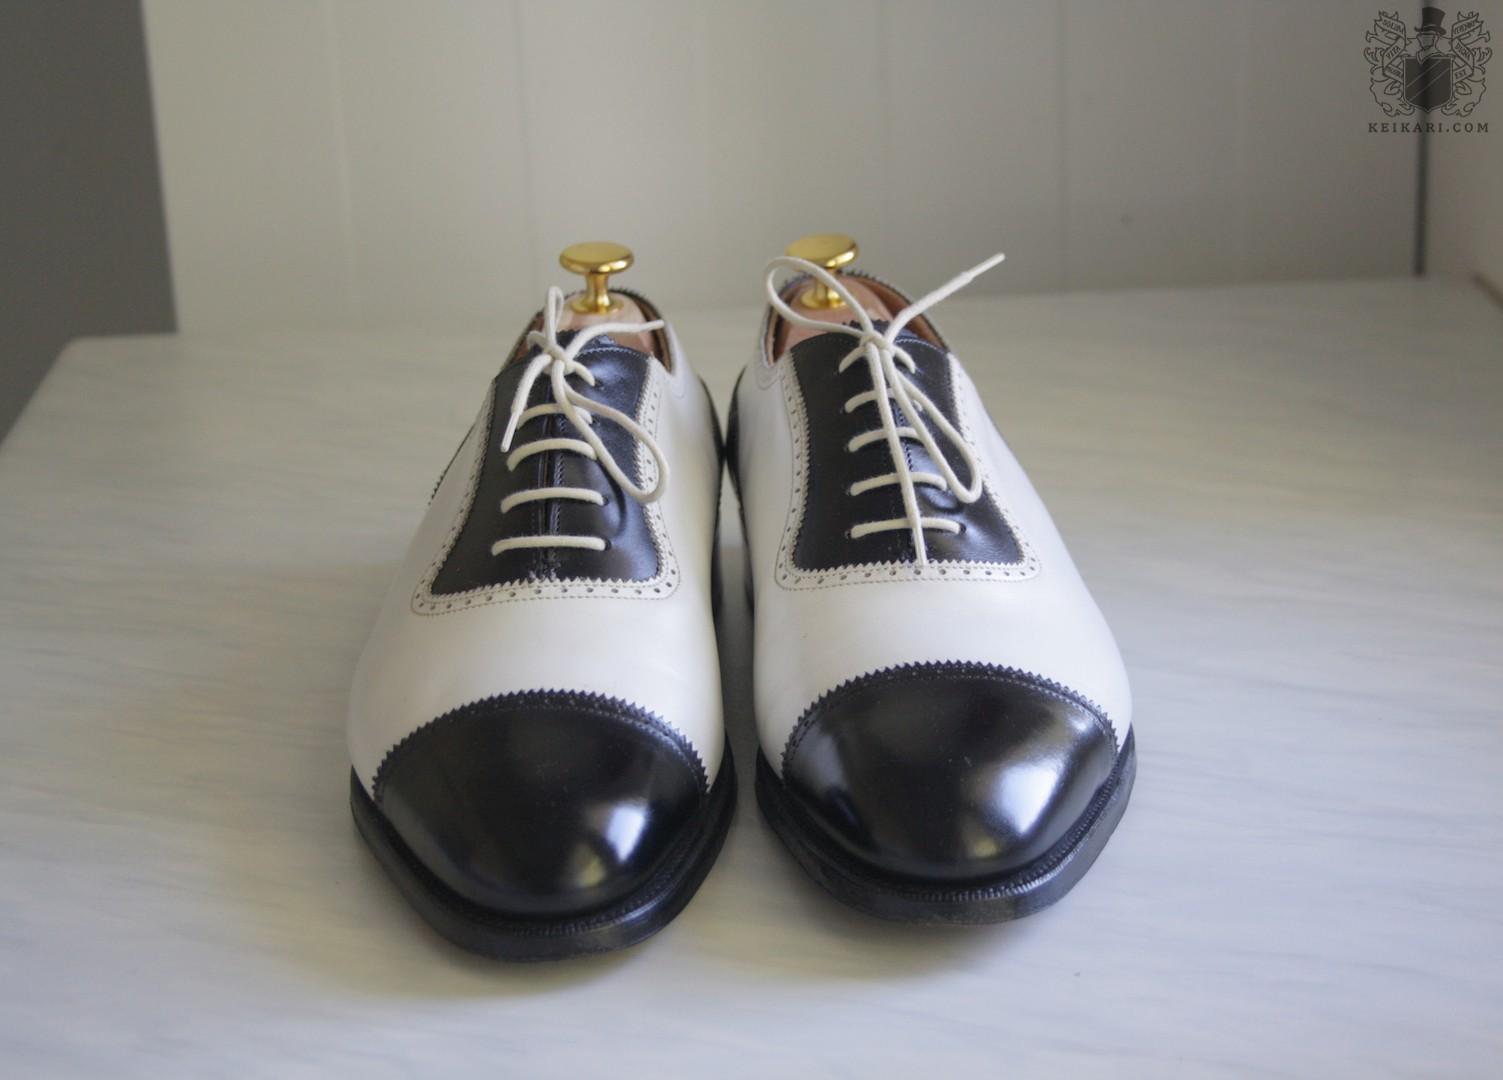 Edward_Green_blackwhite_prototype_spectator_shoes_from_Keikari_dot_com.jpg